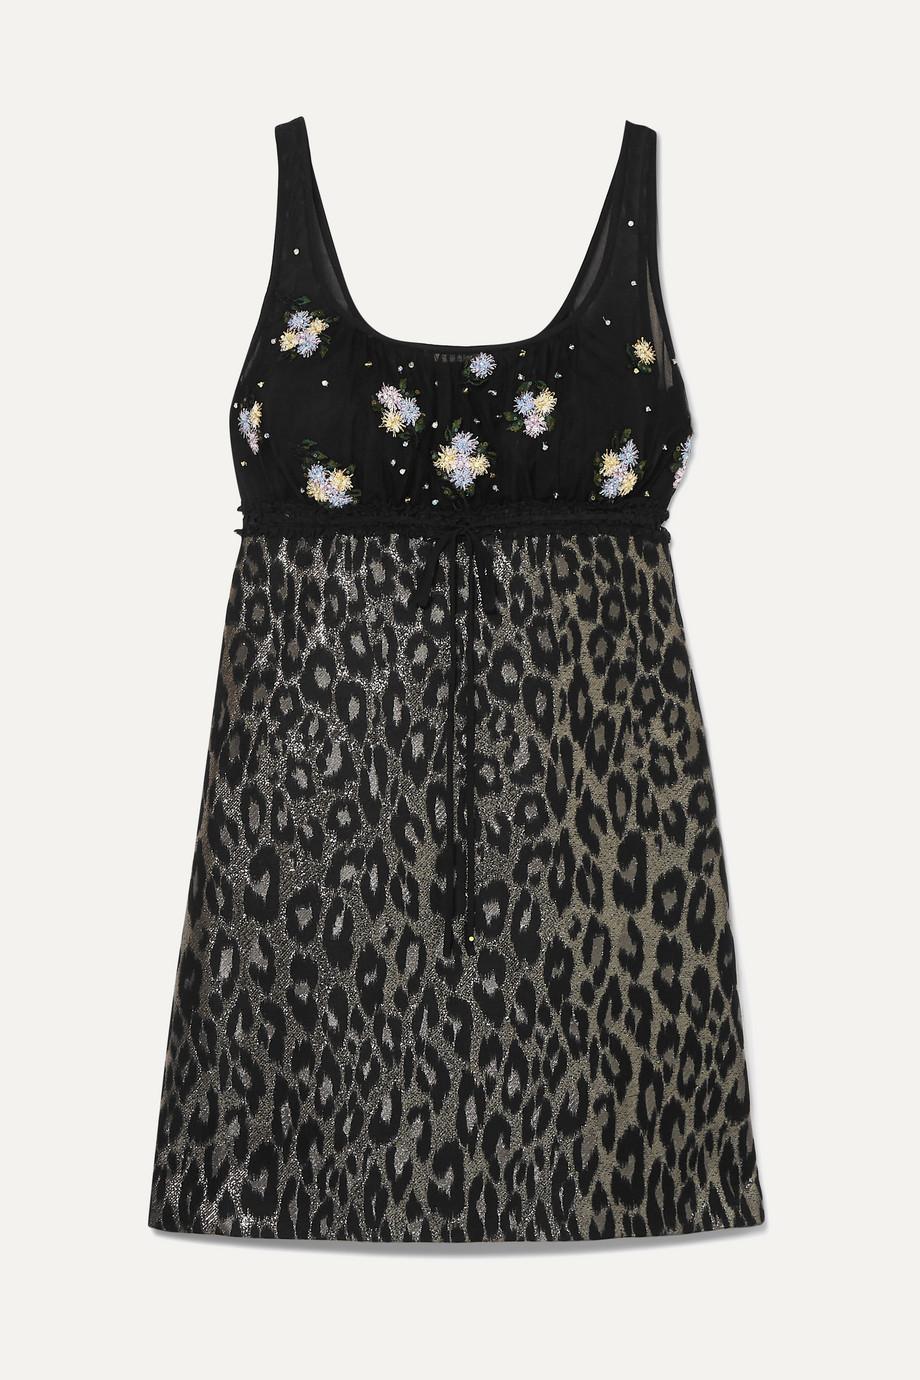 Miu Miu Embroidered tulle and leopard-print jacquard mini dress